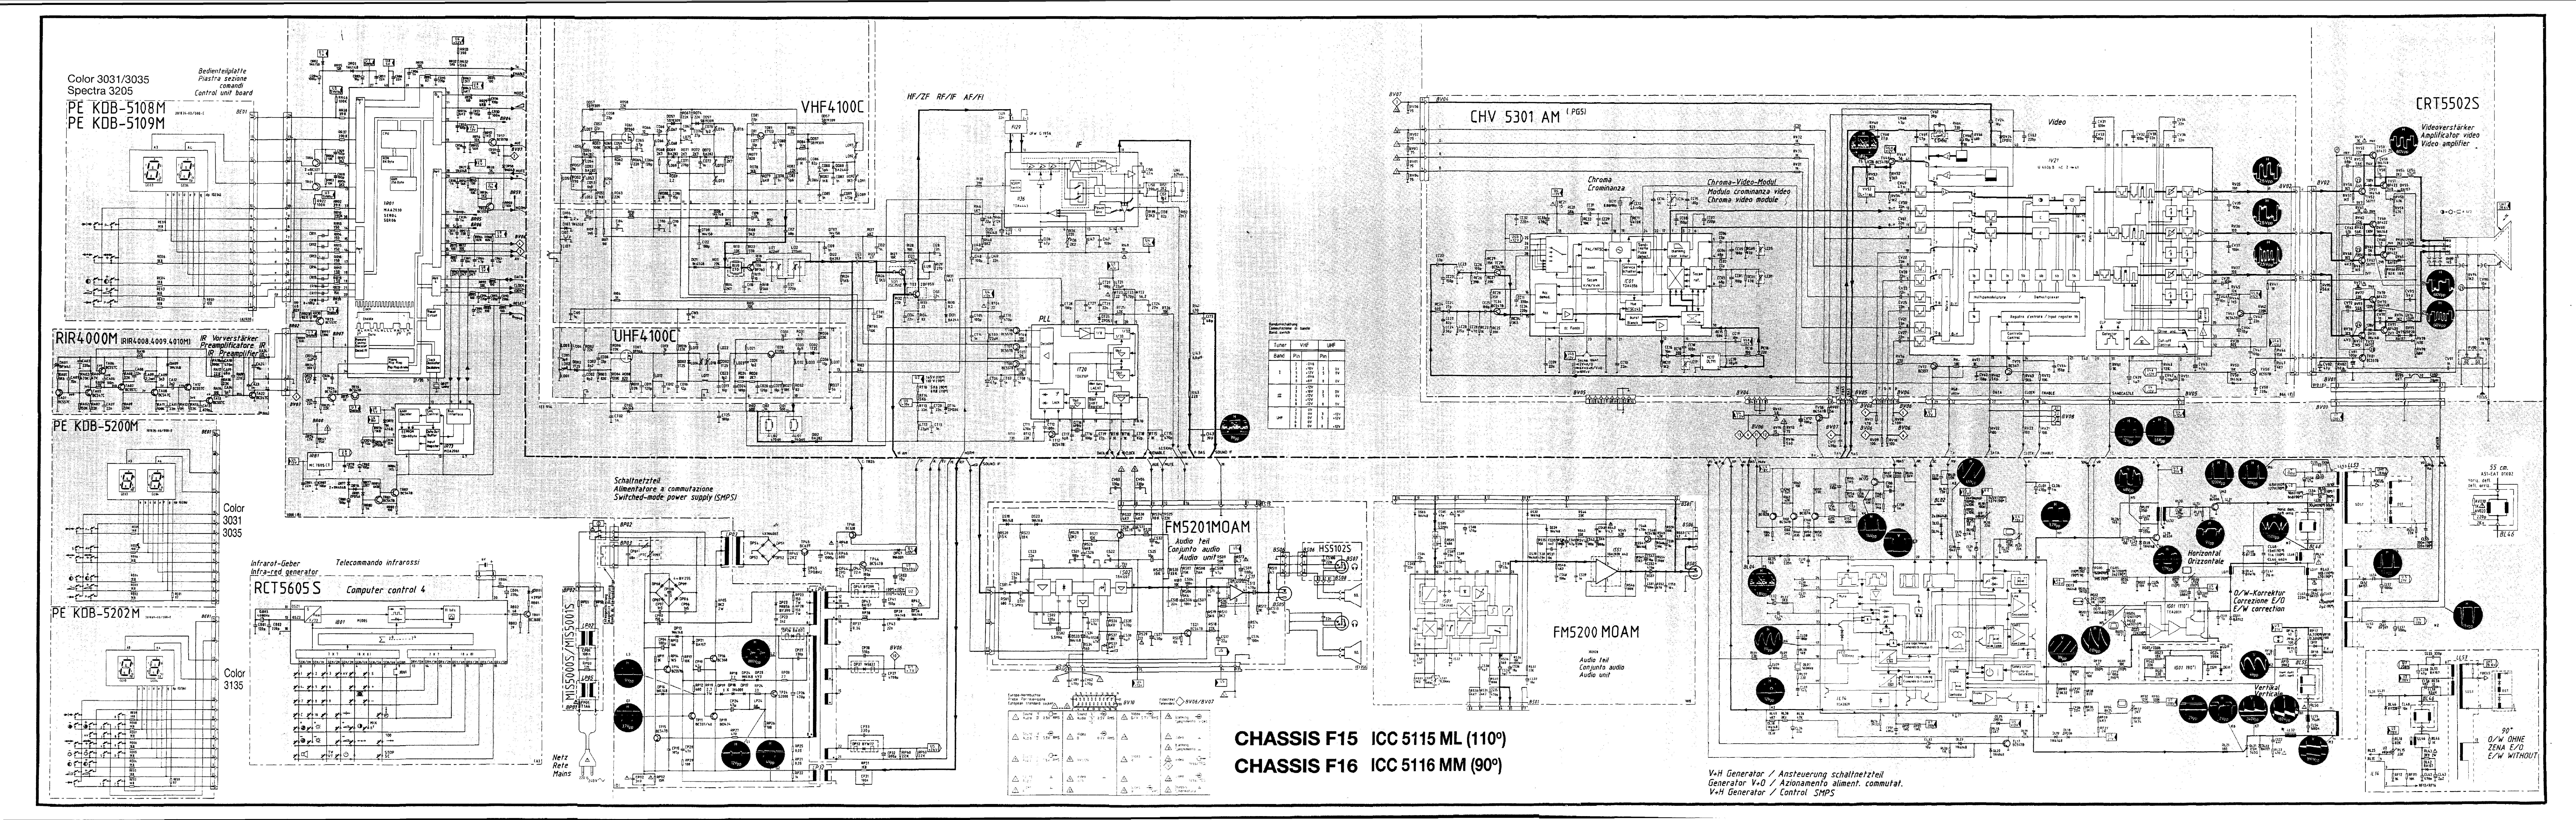 Nordmende Spectra 3205 Service Manual Download  Schematics